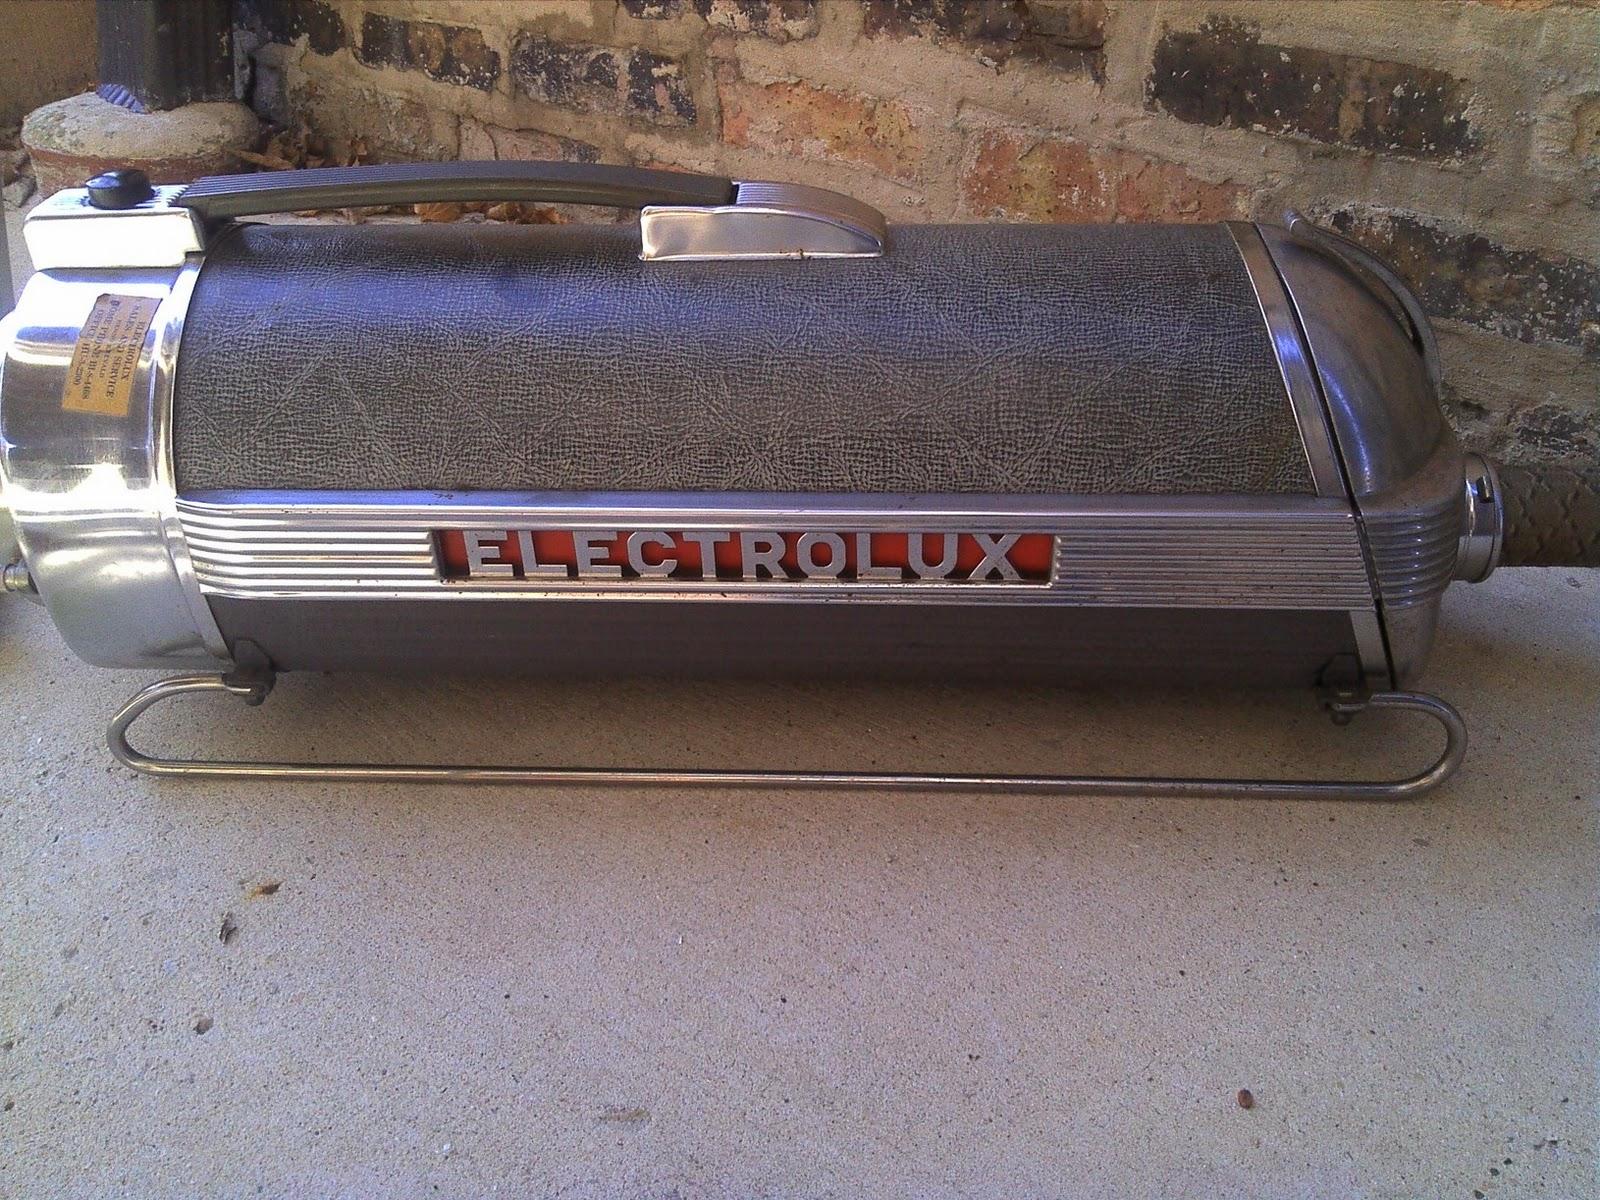 vintage electrolux xxx model 30 chrome canister vacuum working - Electrolux Canister Vacuum